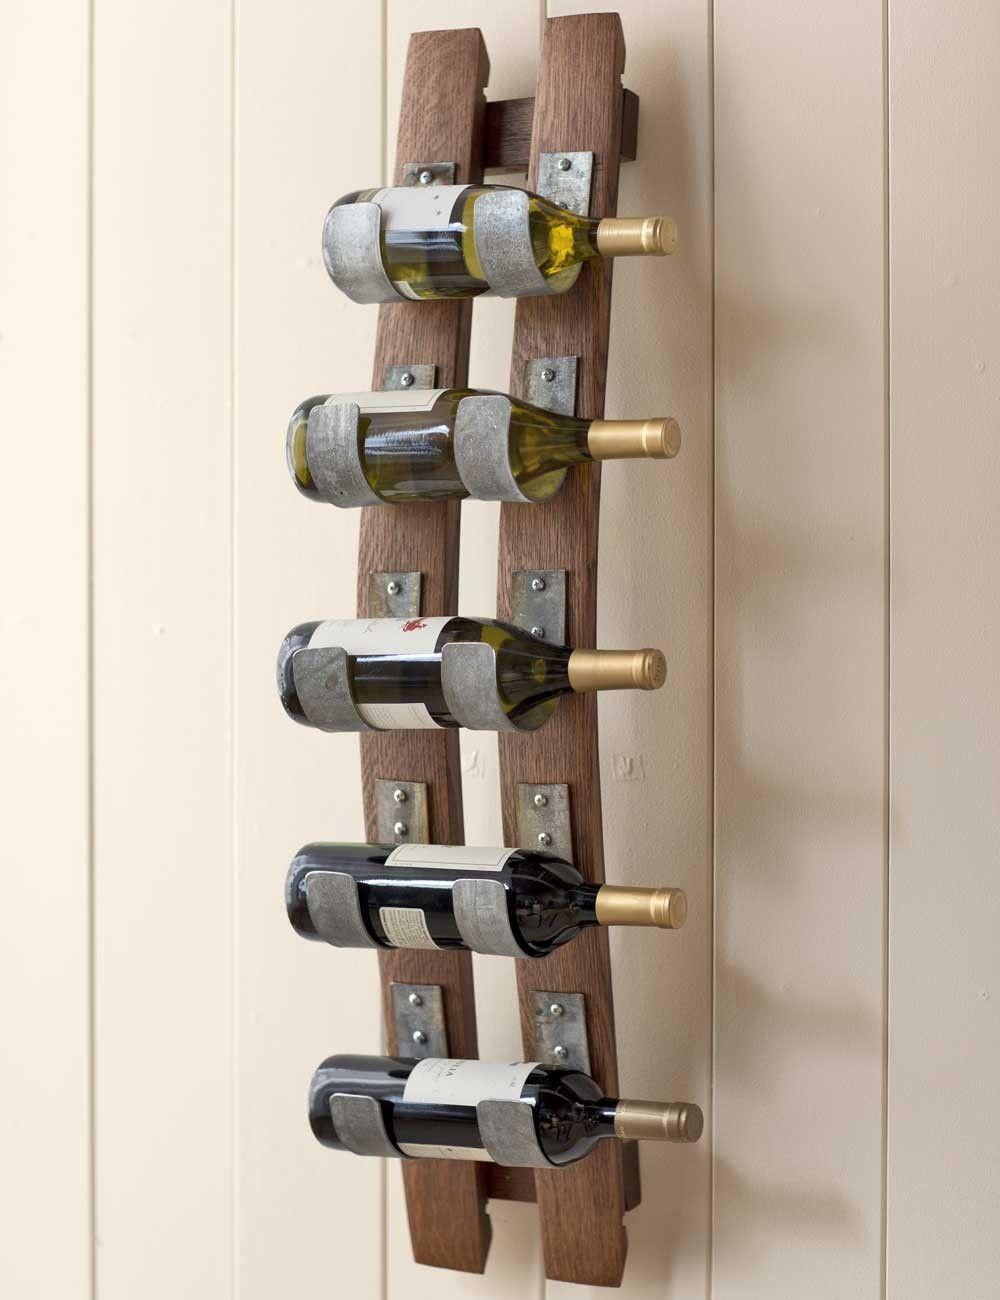 Barrel Wine Rack Móveis De Barril De Vinho Suportes Para Garrafas De Vinho Suportes Para Garrafas